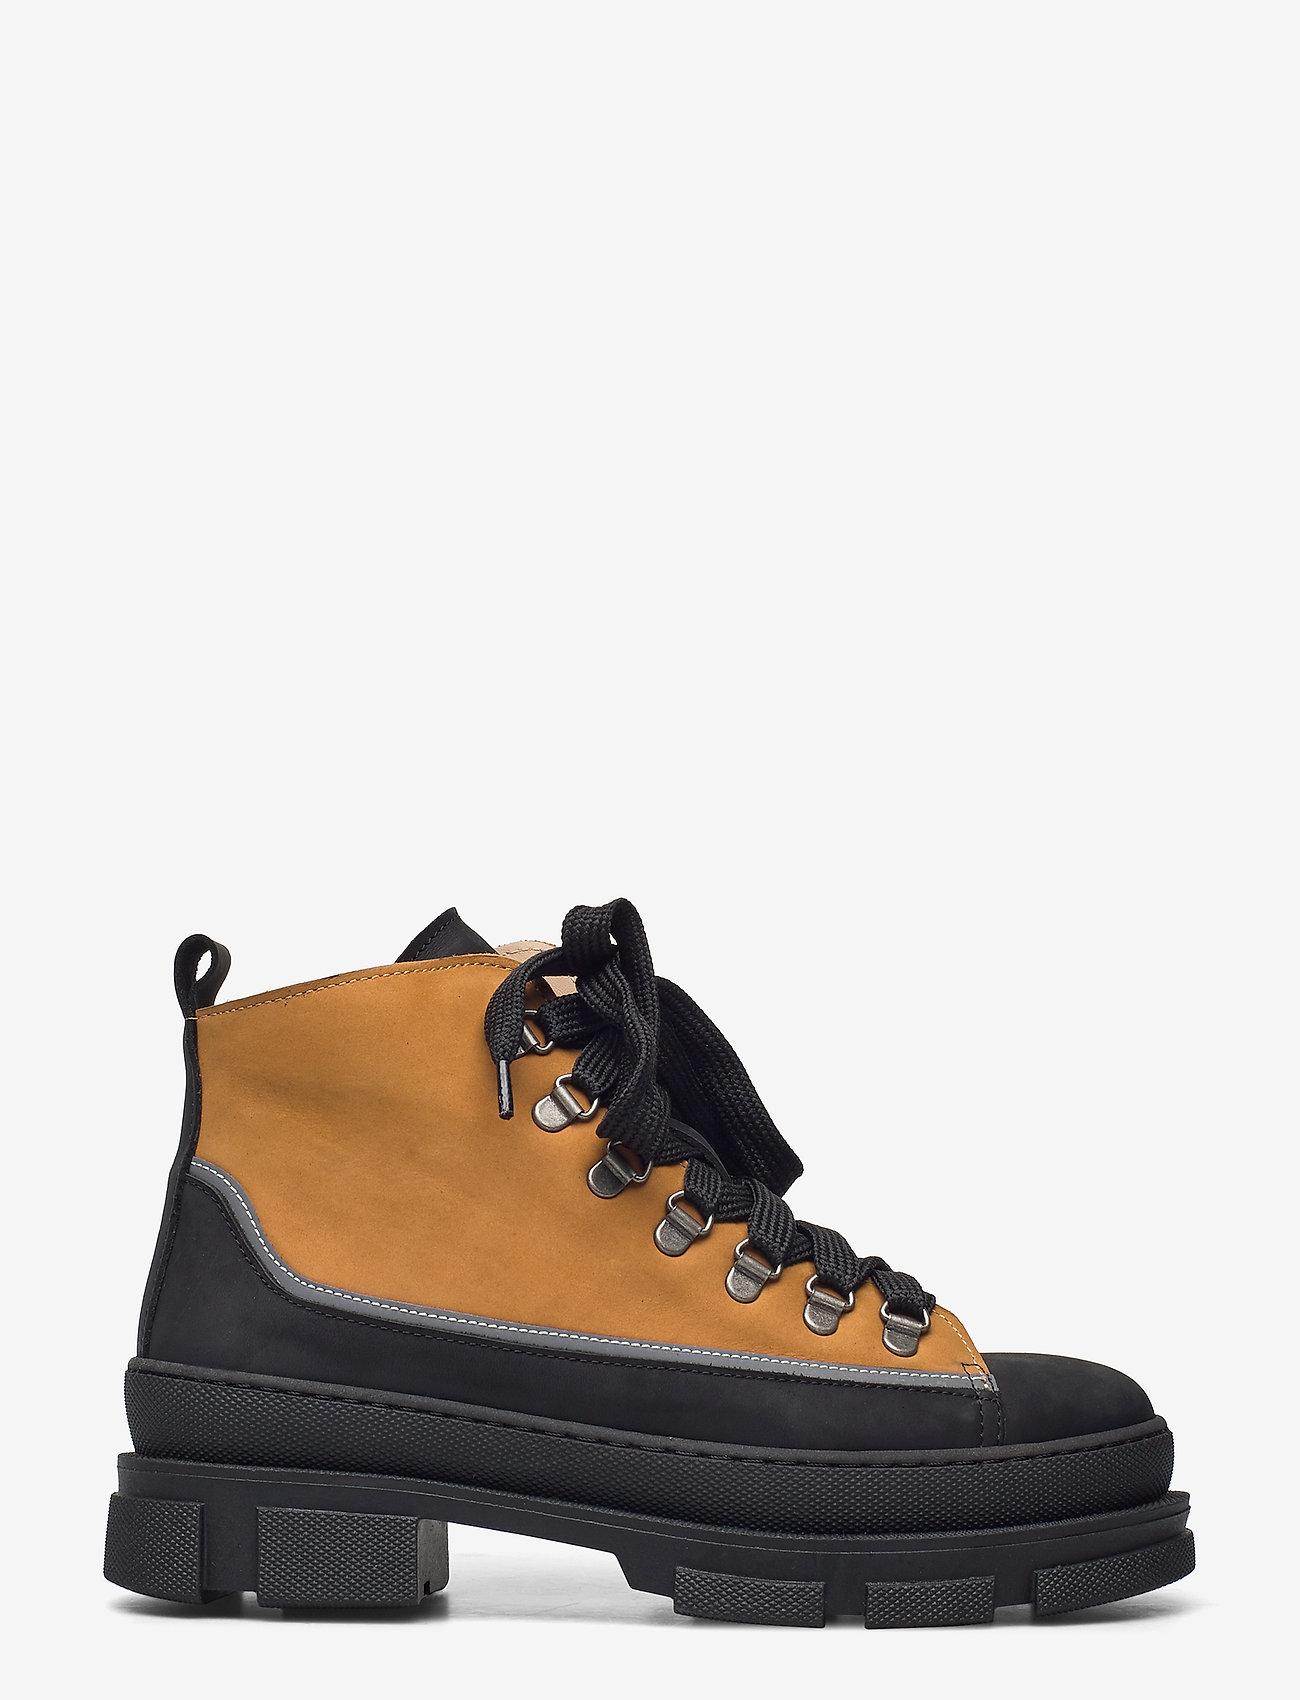 ANGULUS - Boots - flat - flache stiefeletten - 1205/2012/1262 black/reflex/ca - 1